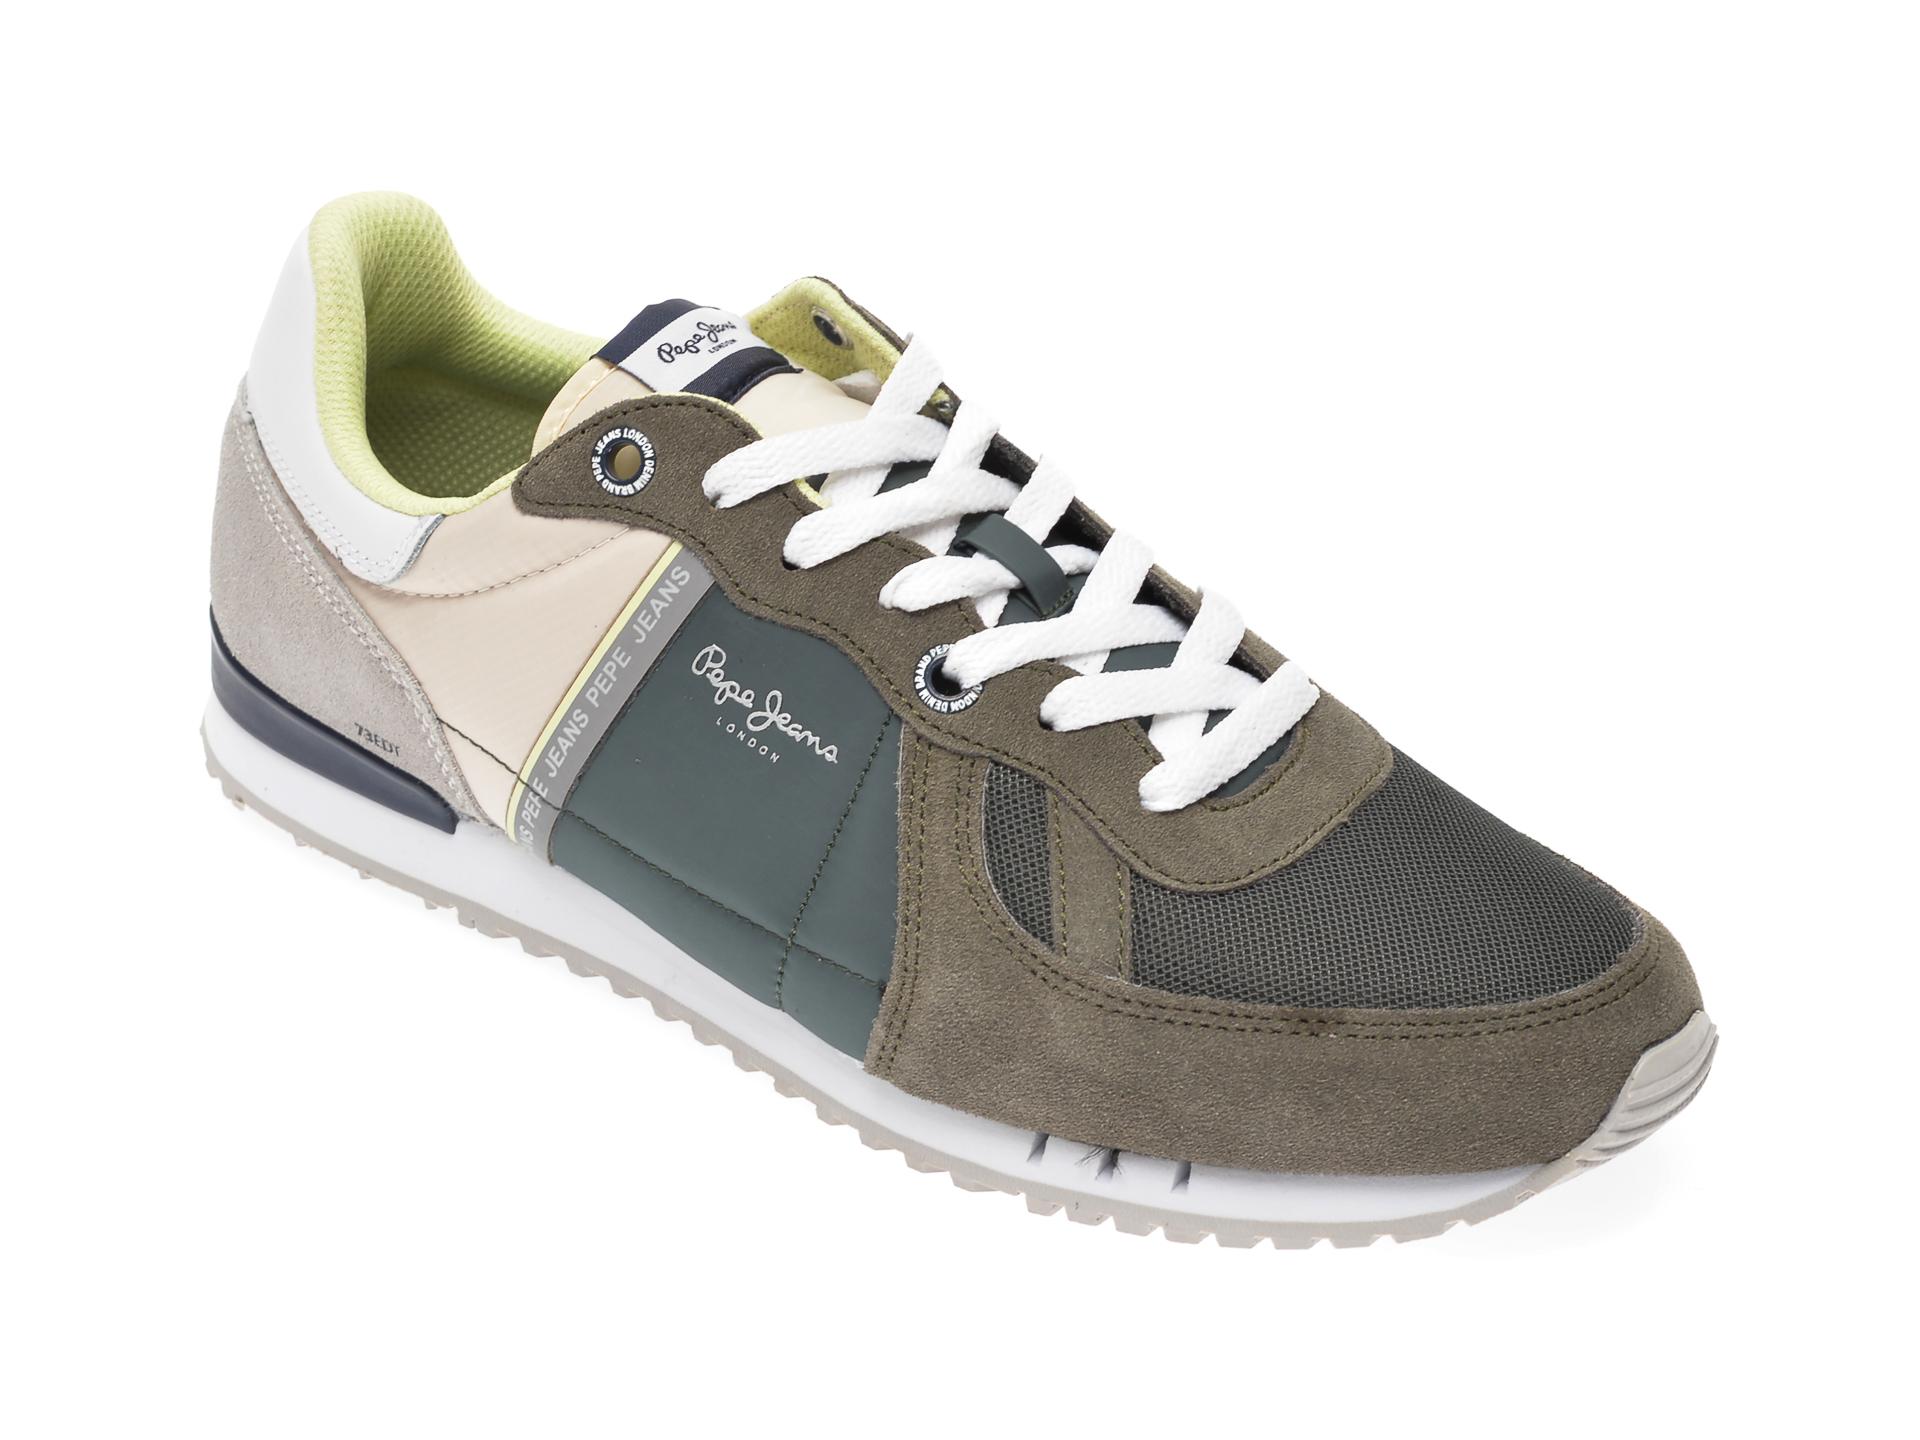 Pantofi sport PEPE JEANS kaki, MS30612, din material textil si piele intoarsa imagine